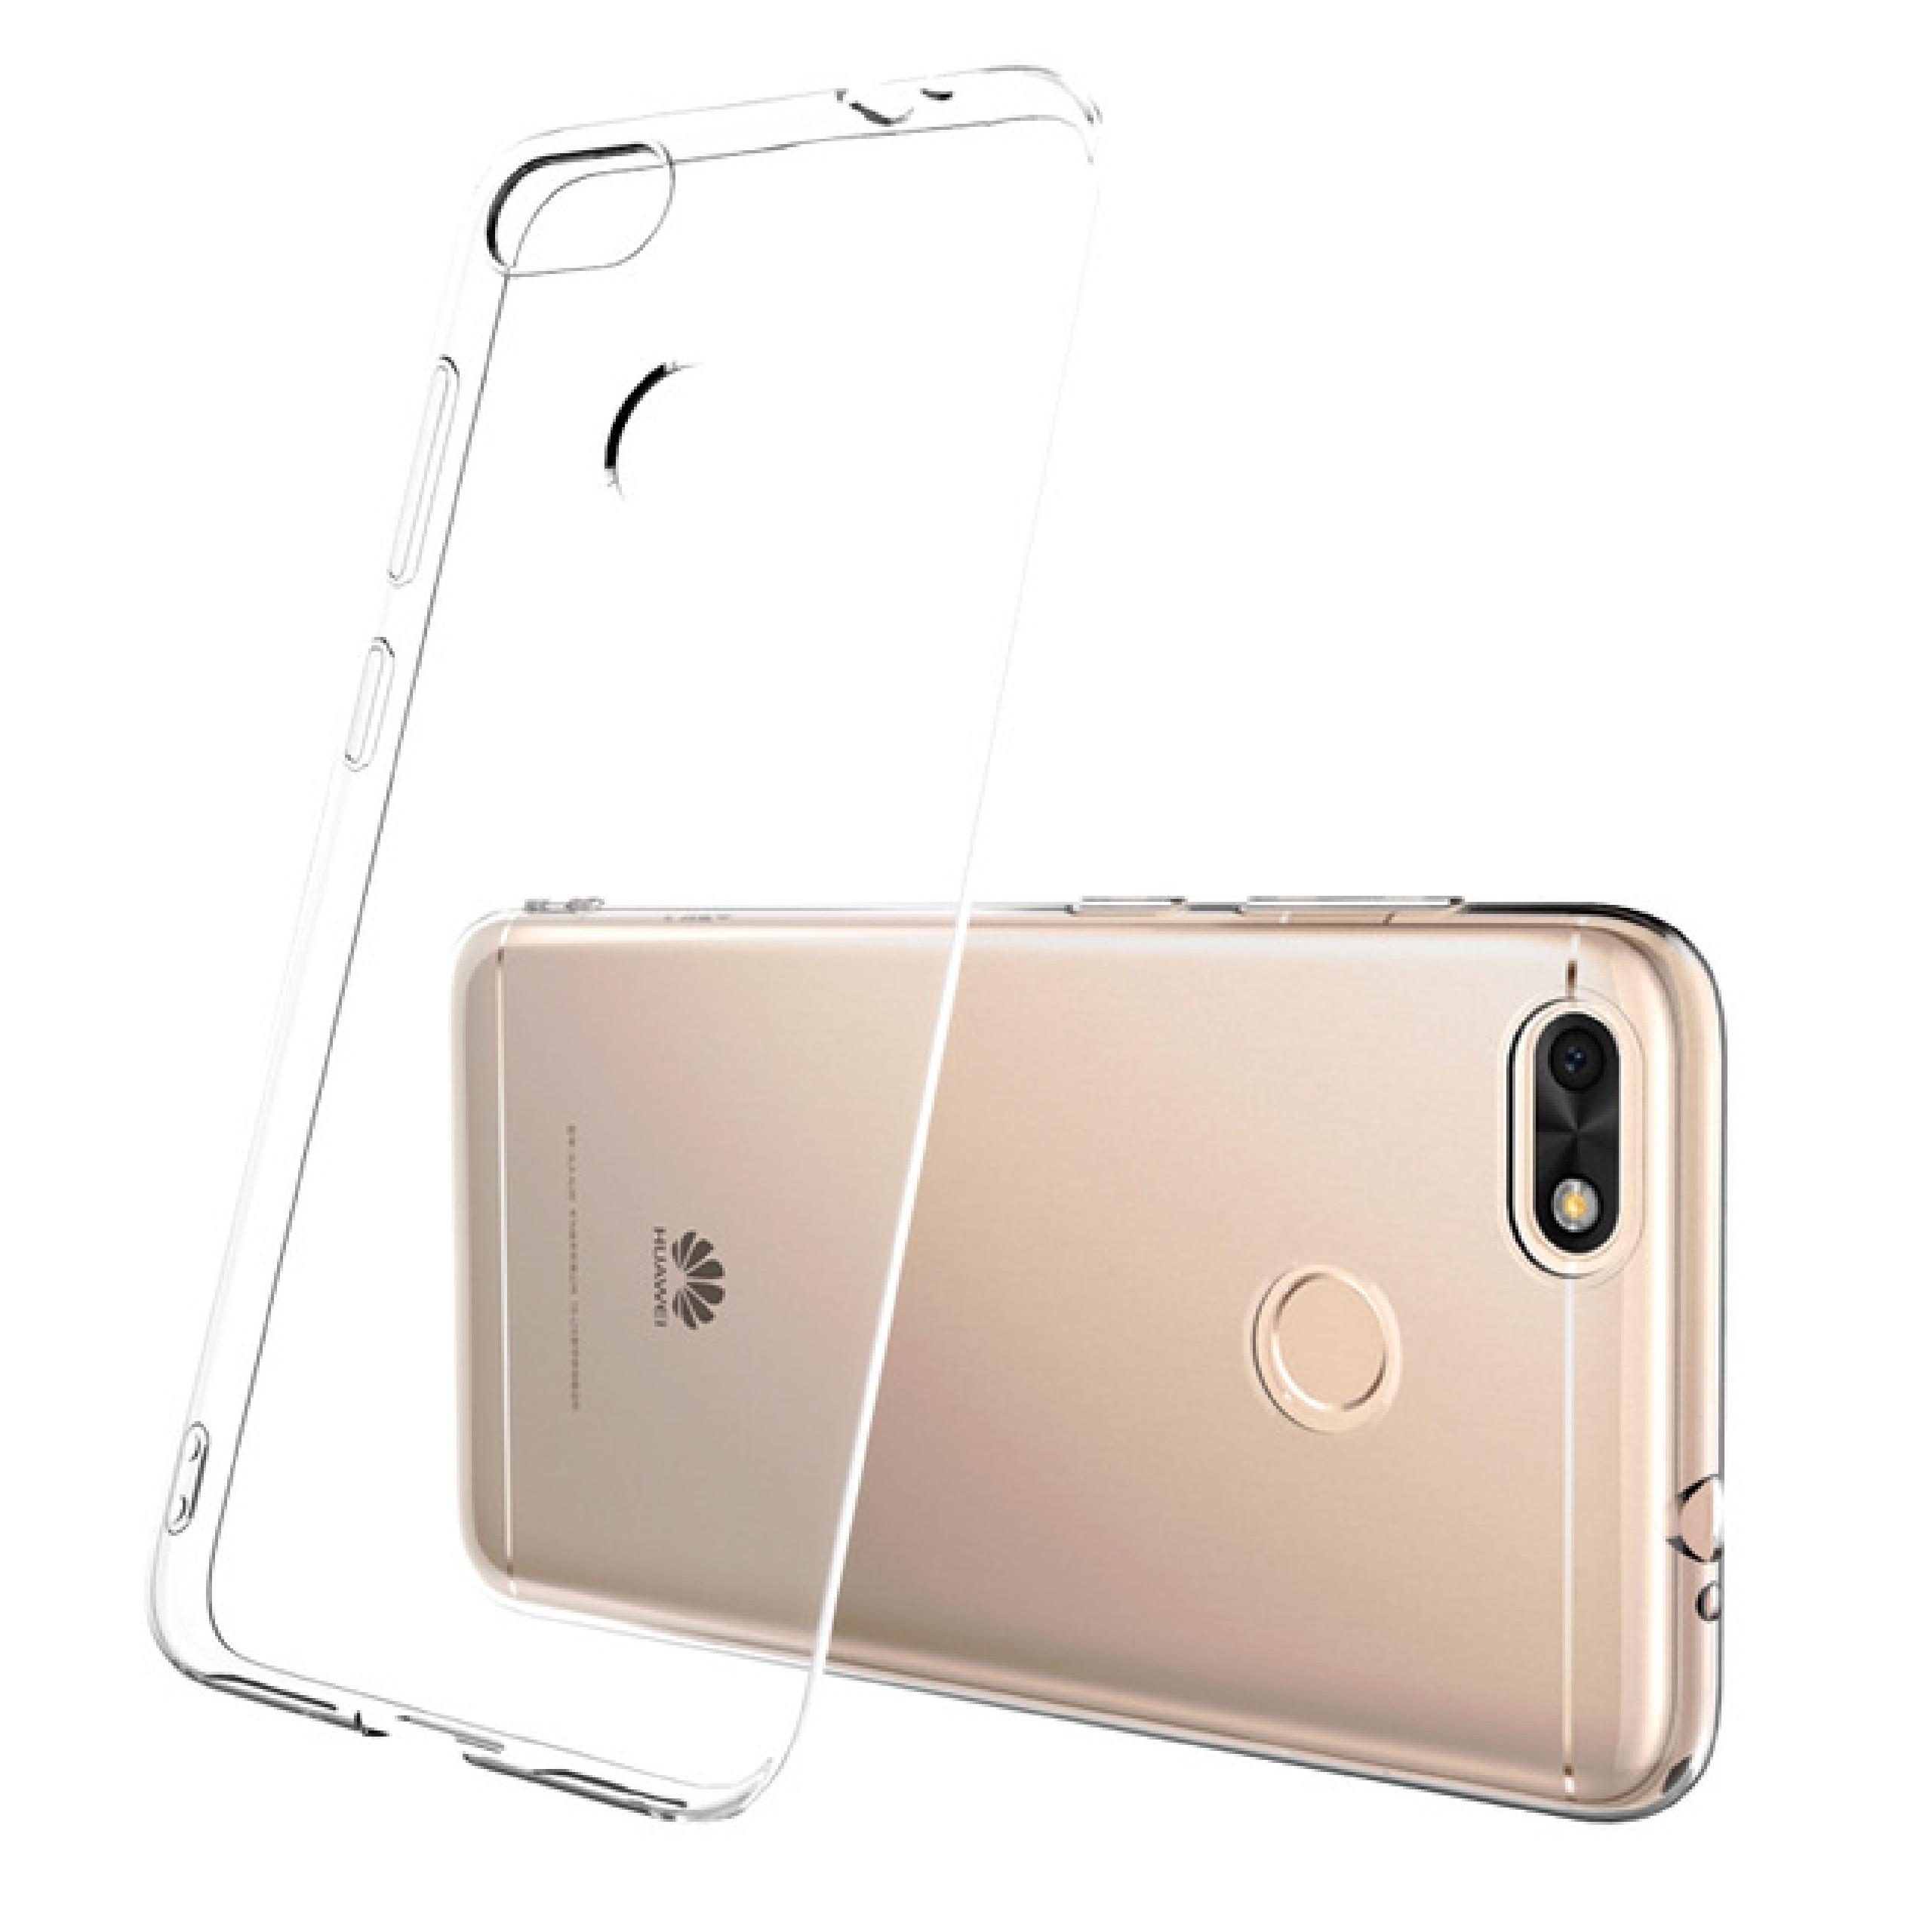 Etui Slim Case Szklo 9h Do Huawei P9 Lite Mini 7623427201 Sklep Internetowy Agd Rtv Telefony Laptopy Allegro Pl